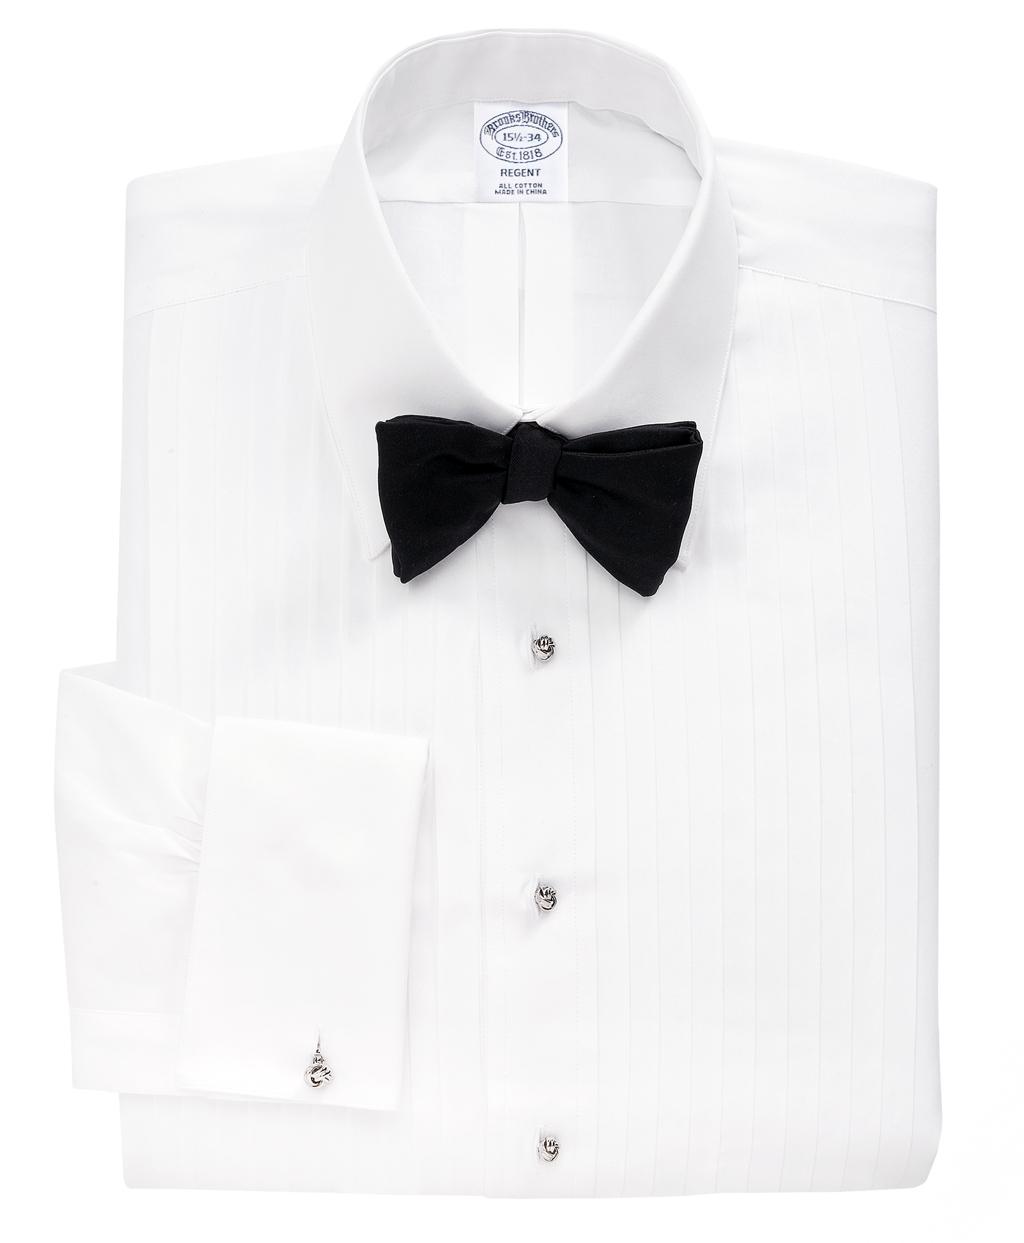 bbef14a6112 Men's Slim Fit Ten-Pleat Tennis Collar Tuxedo Shirt